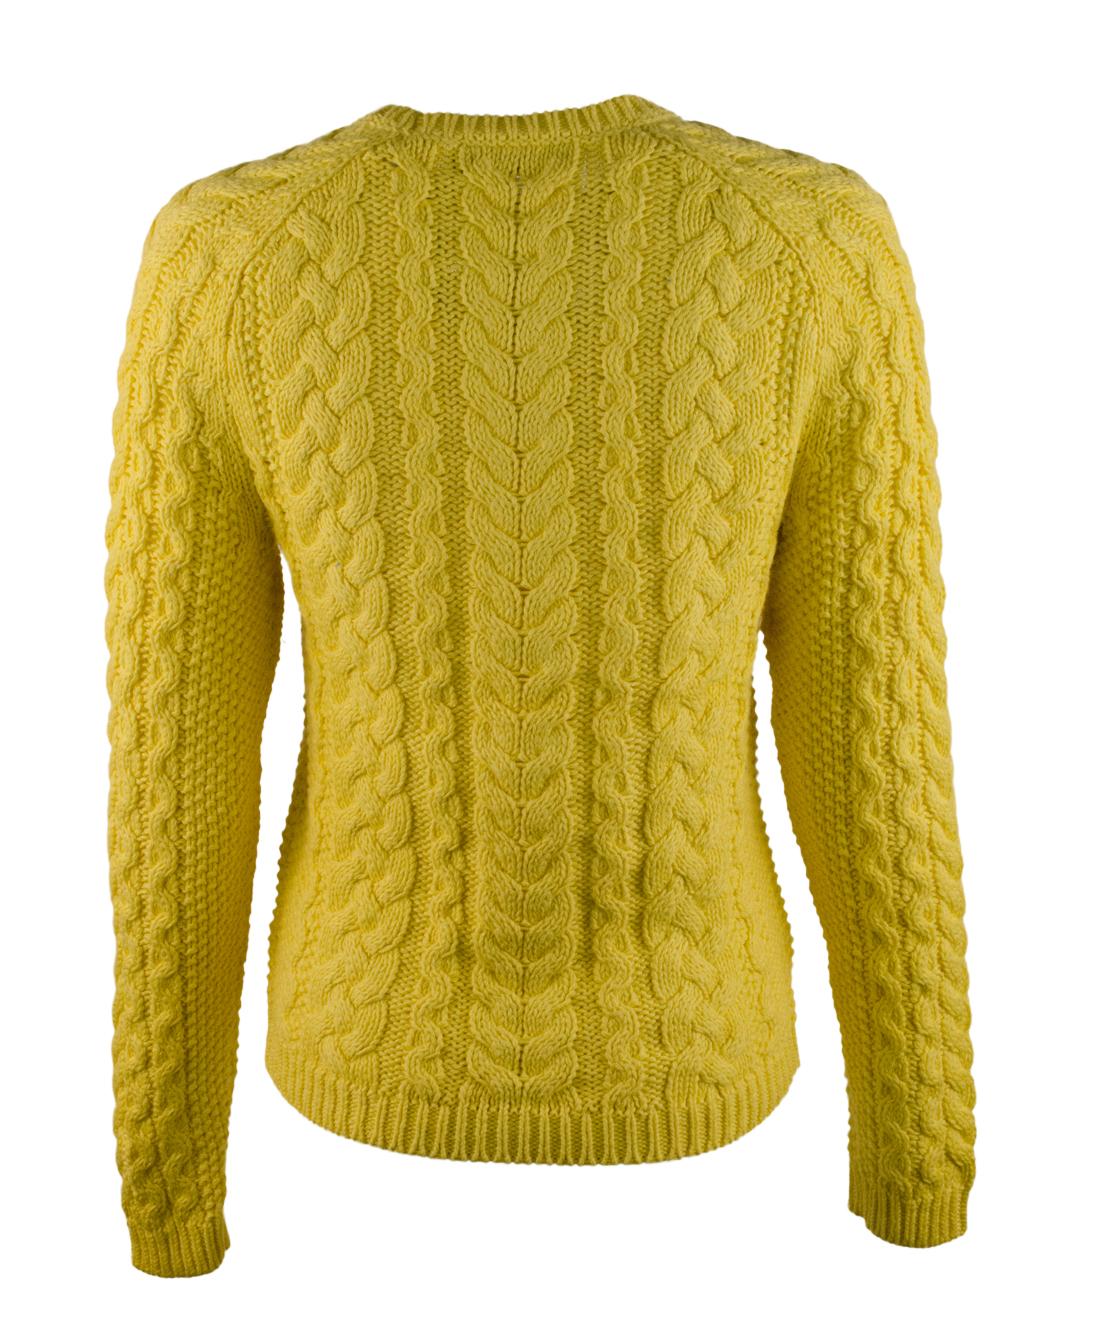 Polo Ralph Lauren Women's Aran-Knit Crew-neck Sweater | eBay